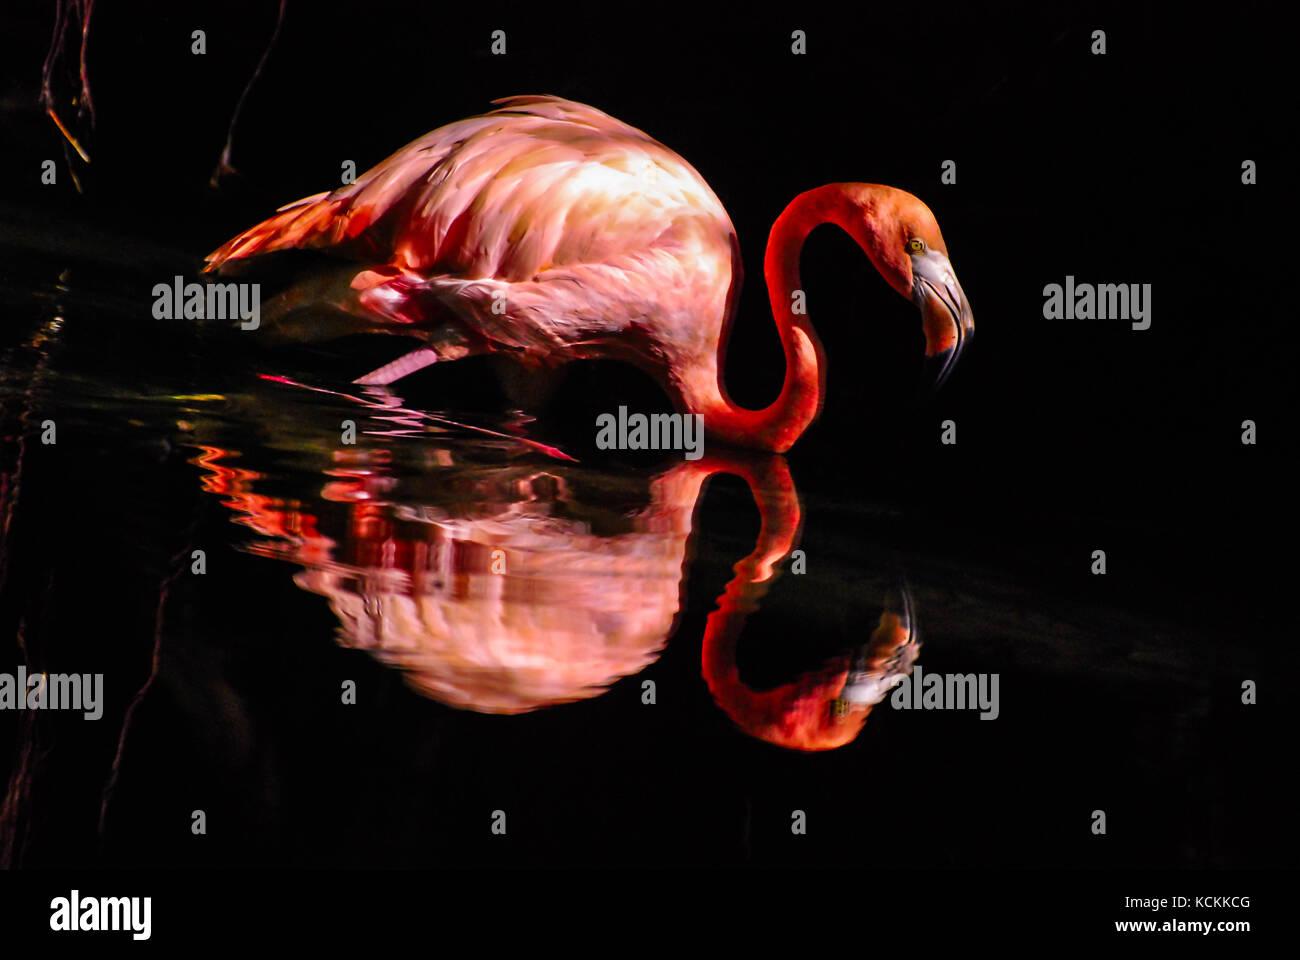 Pink flamingo reflected in water. Dark background Stock Photo